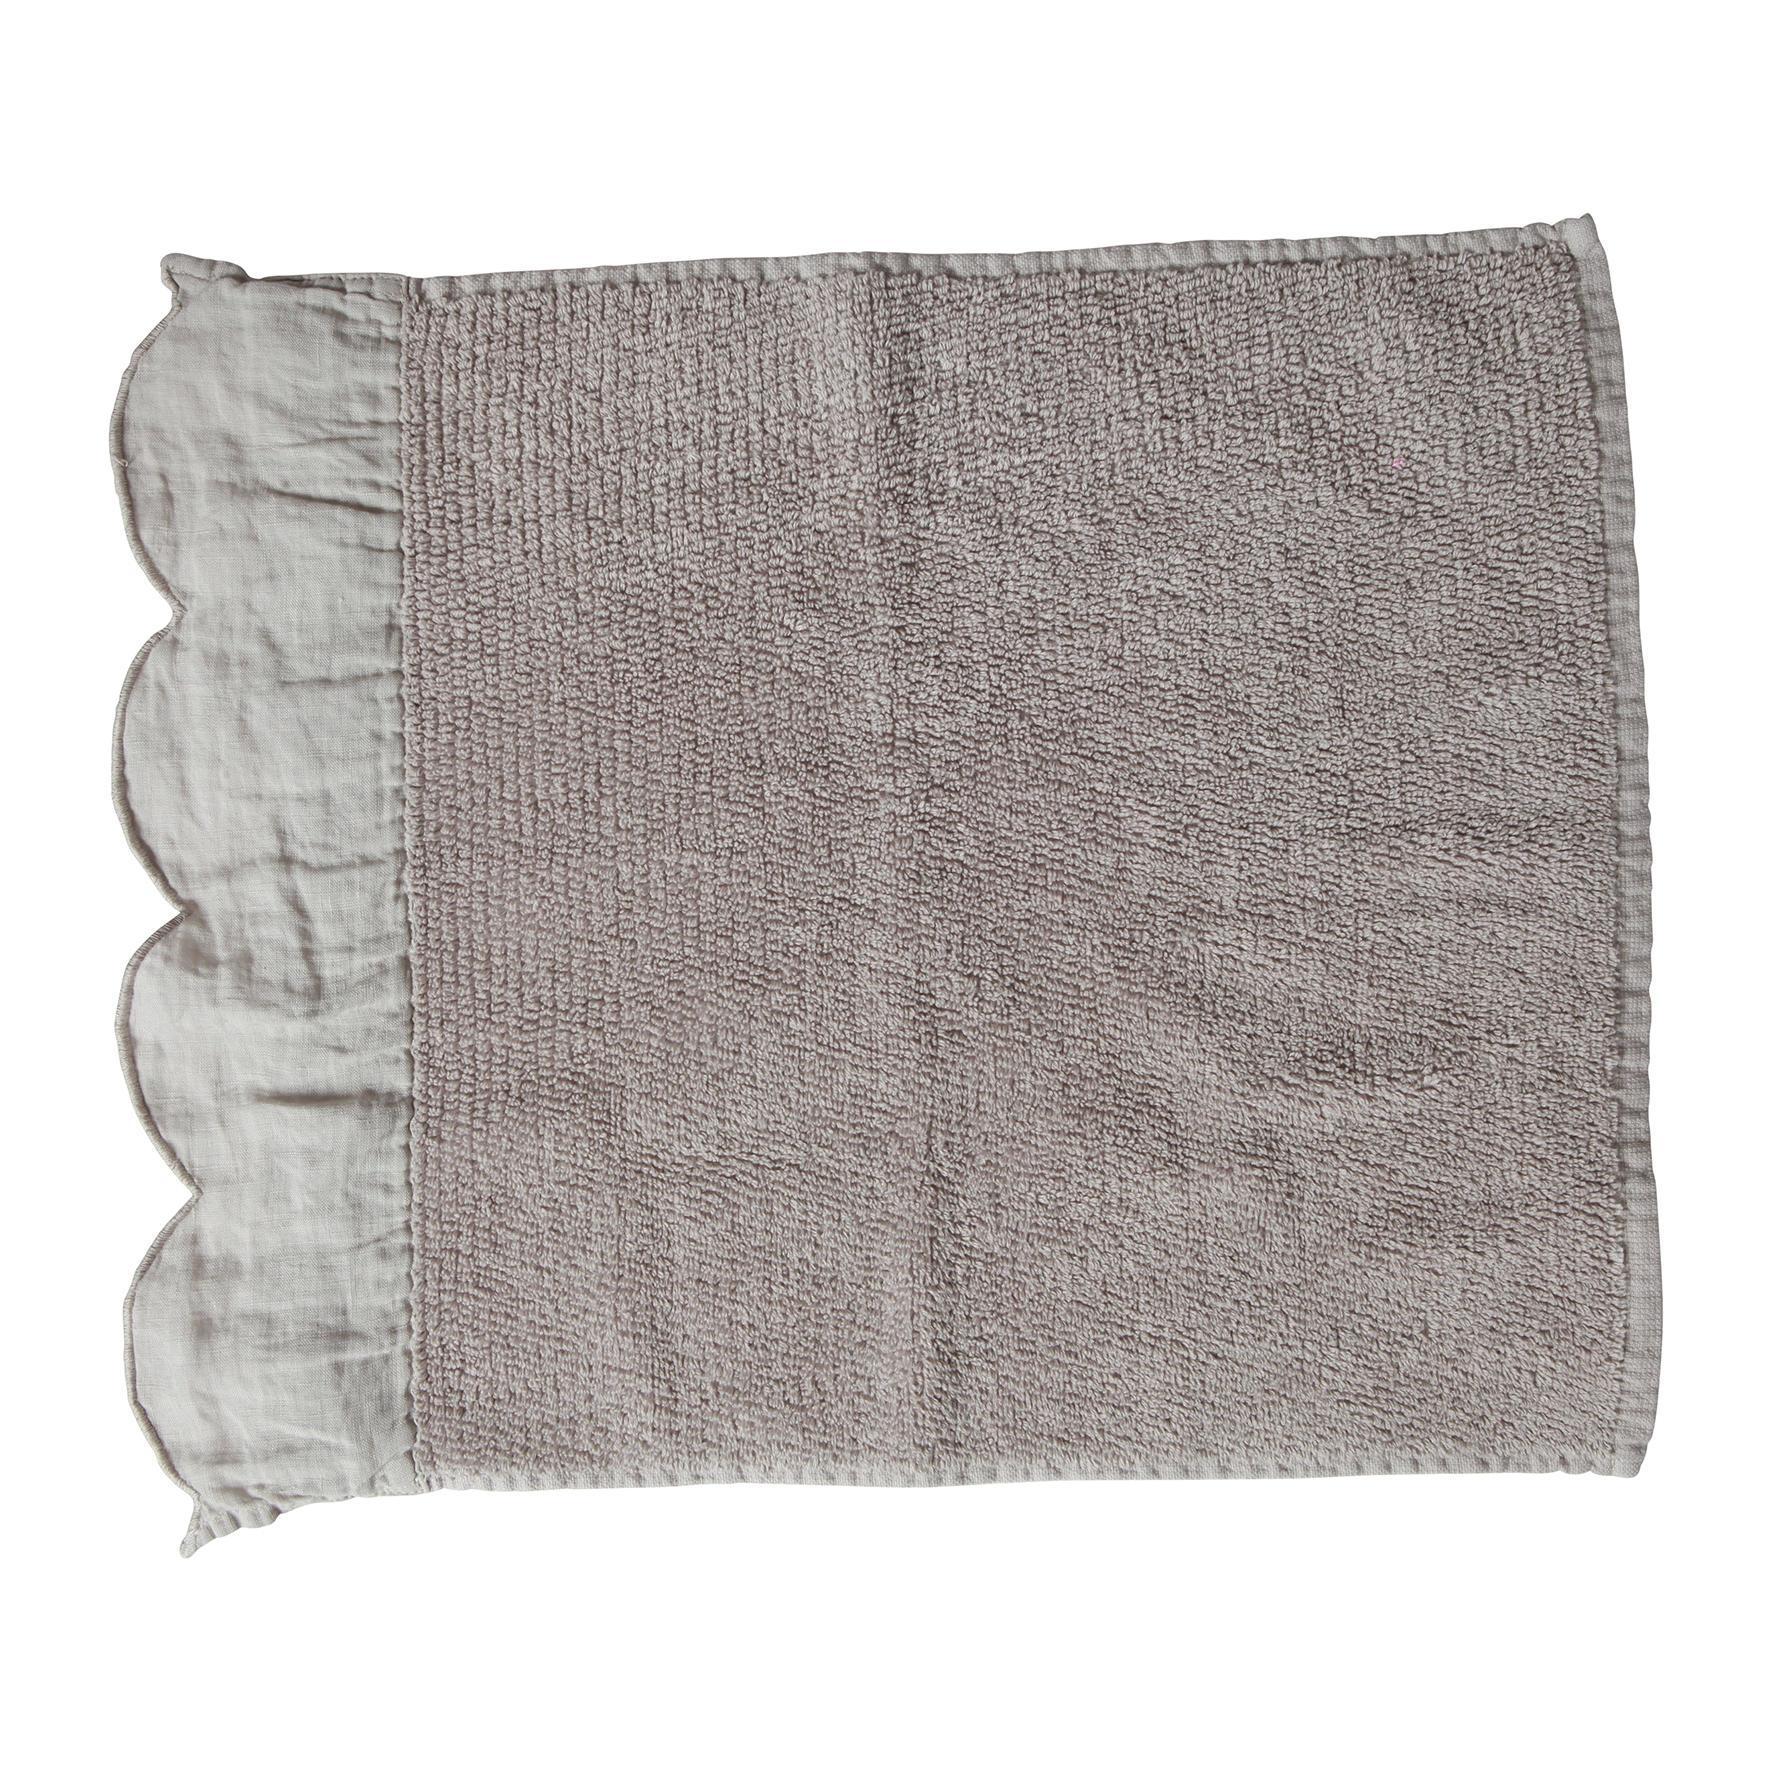 CÔTÉ TABLE Froté ručník Fris Gris 55x90 cm, béžová barva, šedá barva, textil